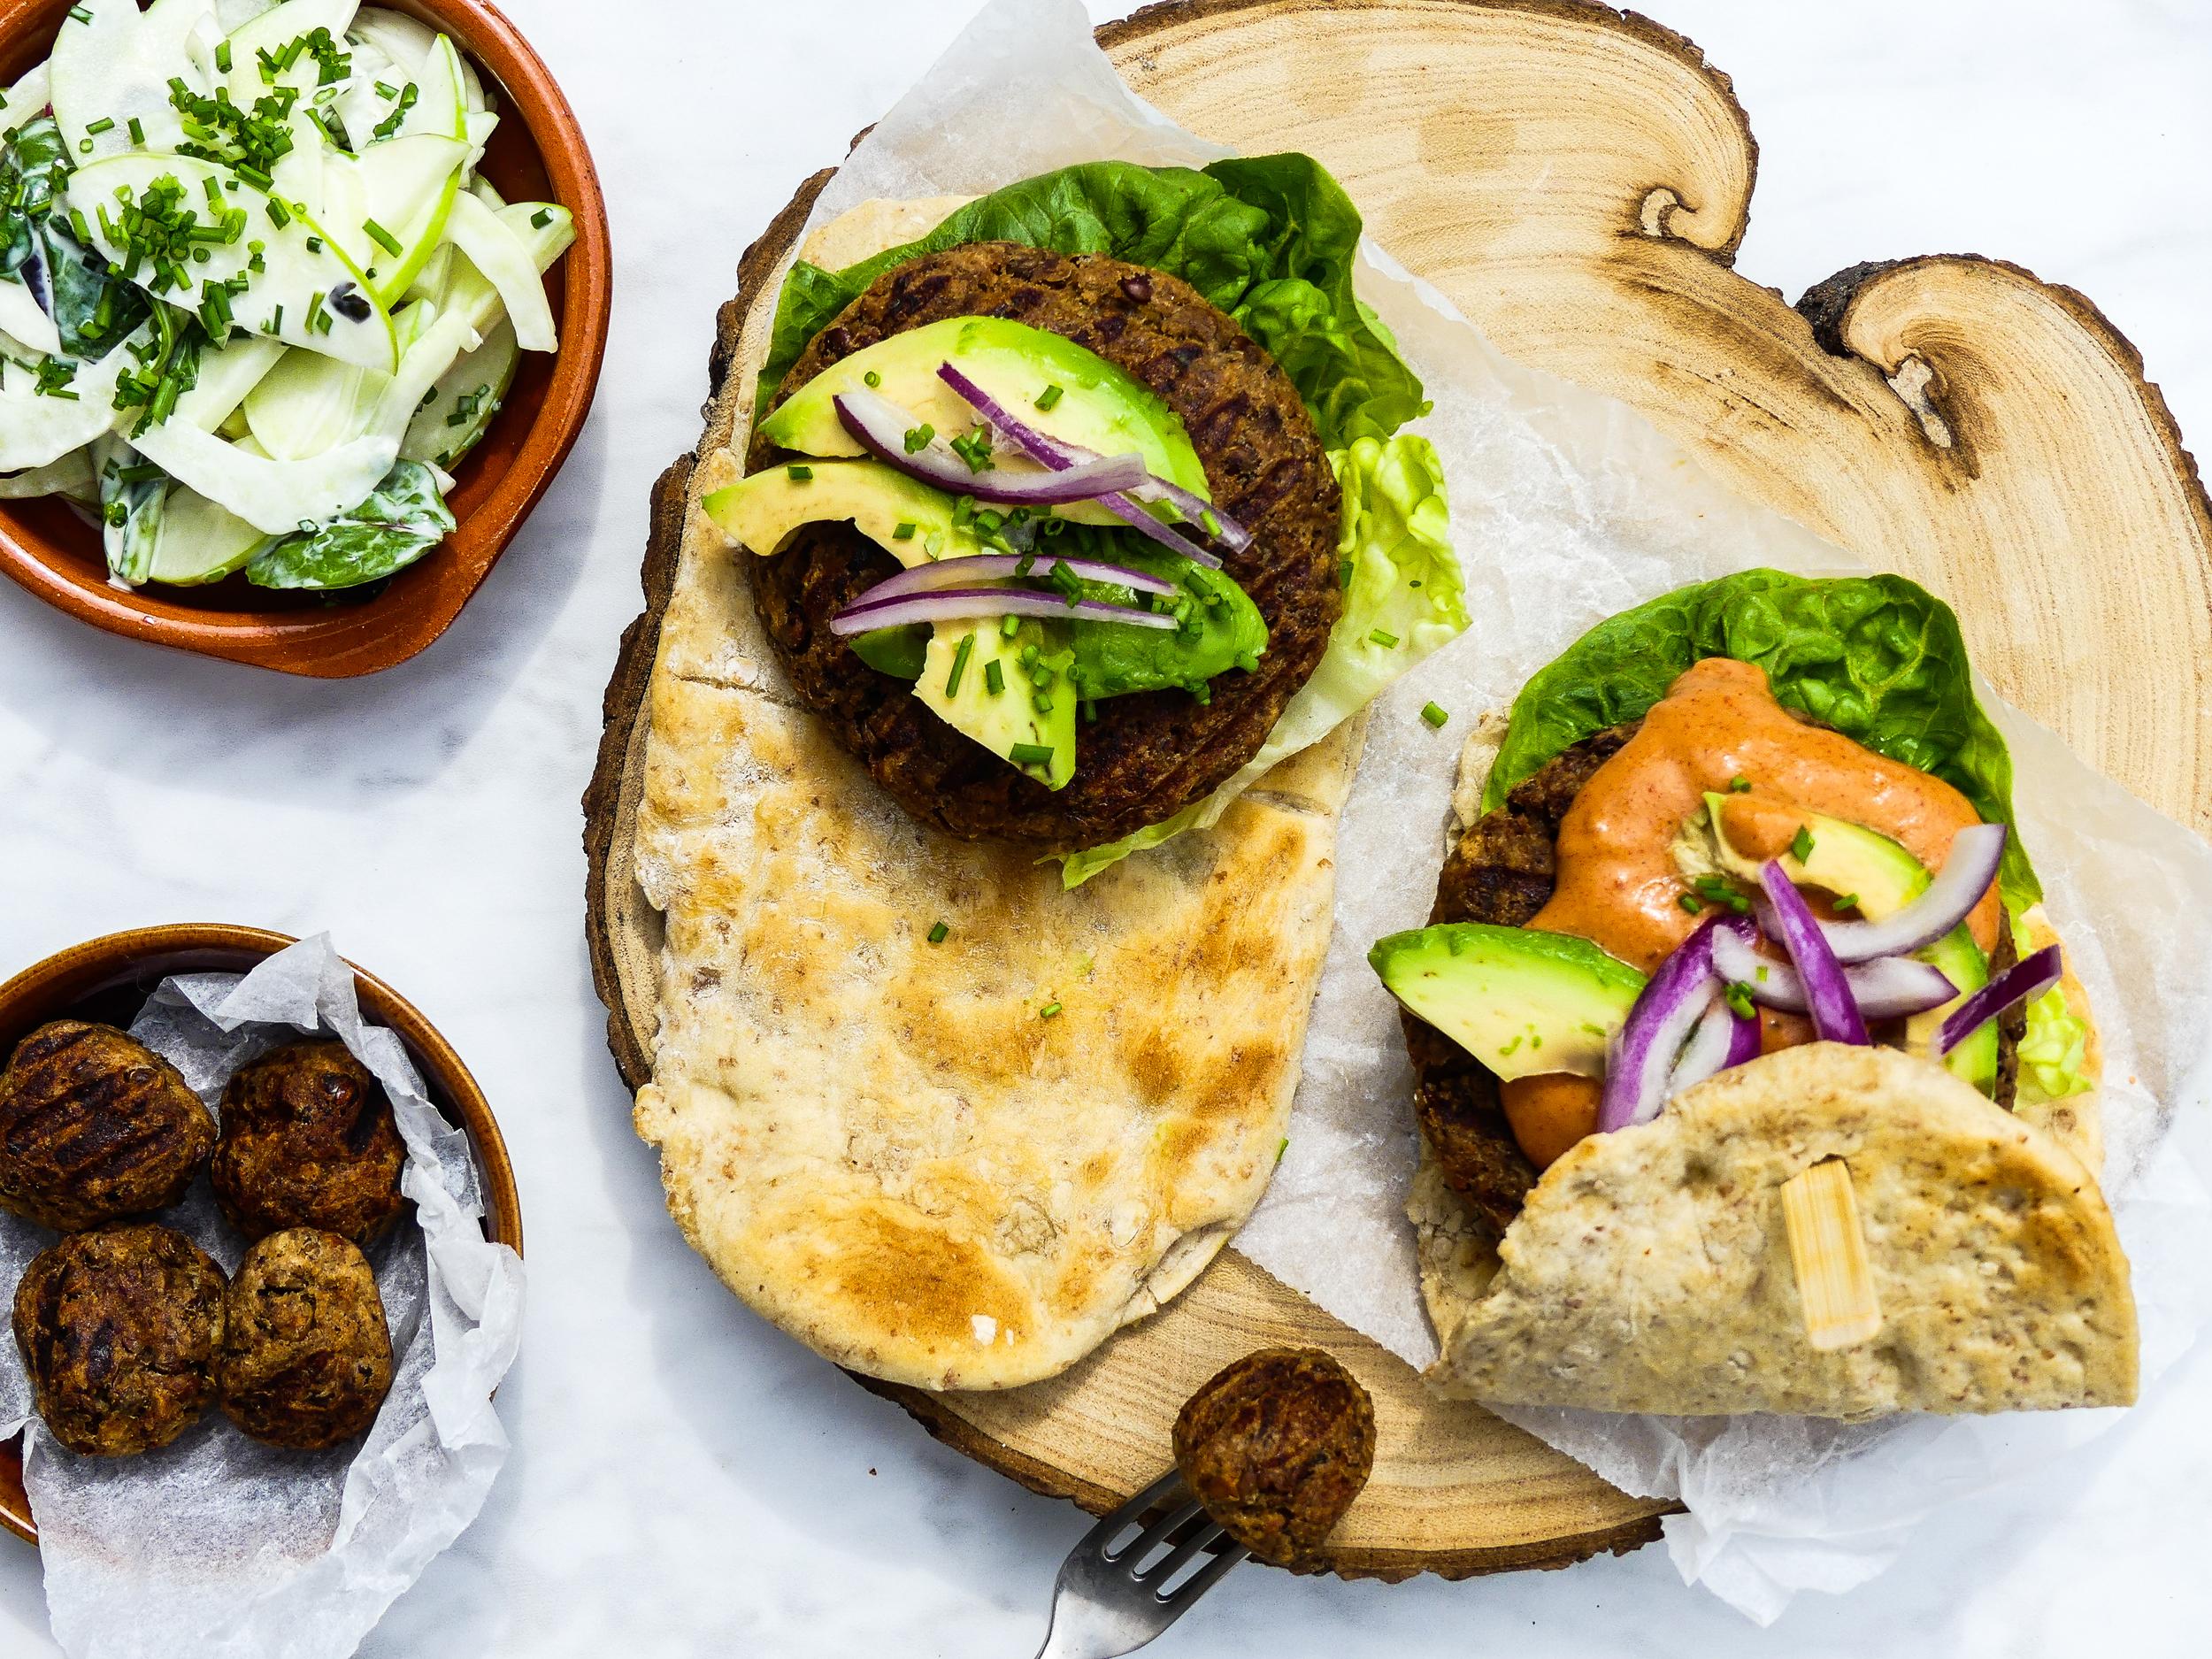 Fully Vegan, Chick Pea & Lentil Burger on self made pita bread!